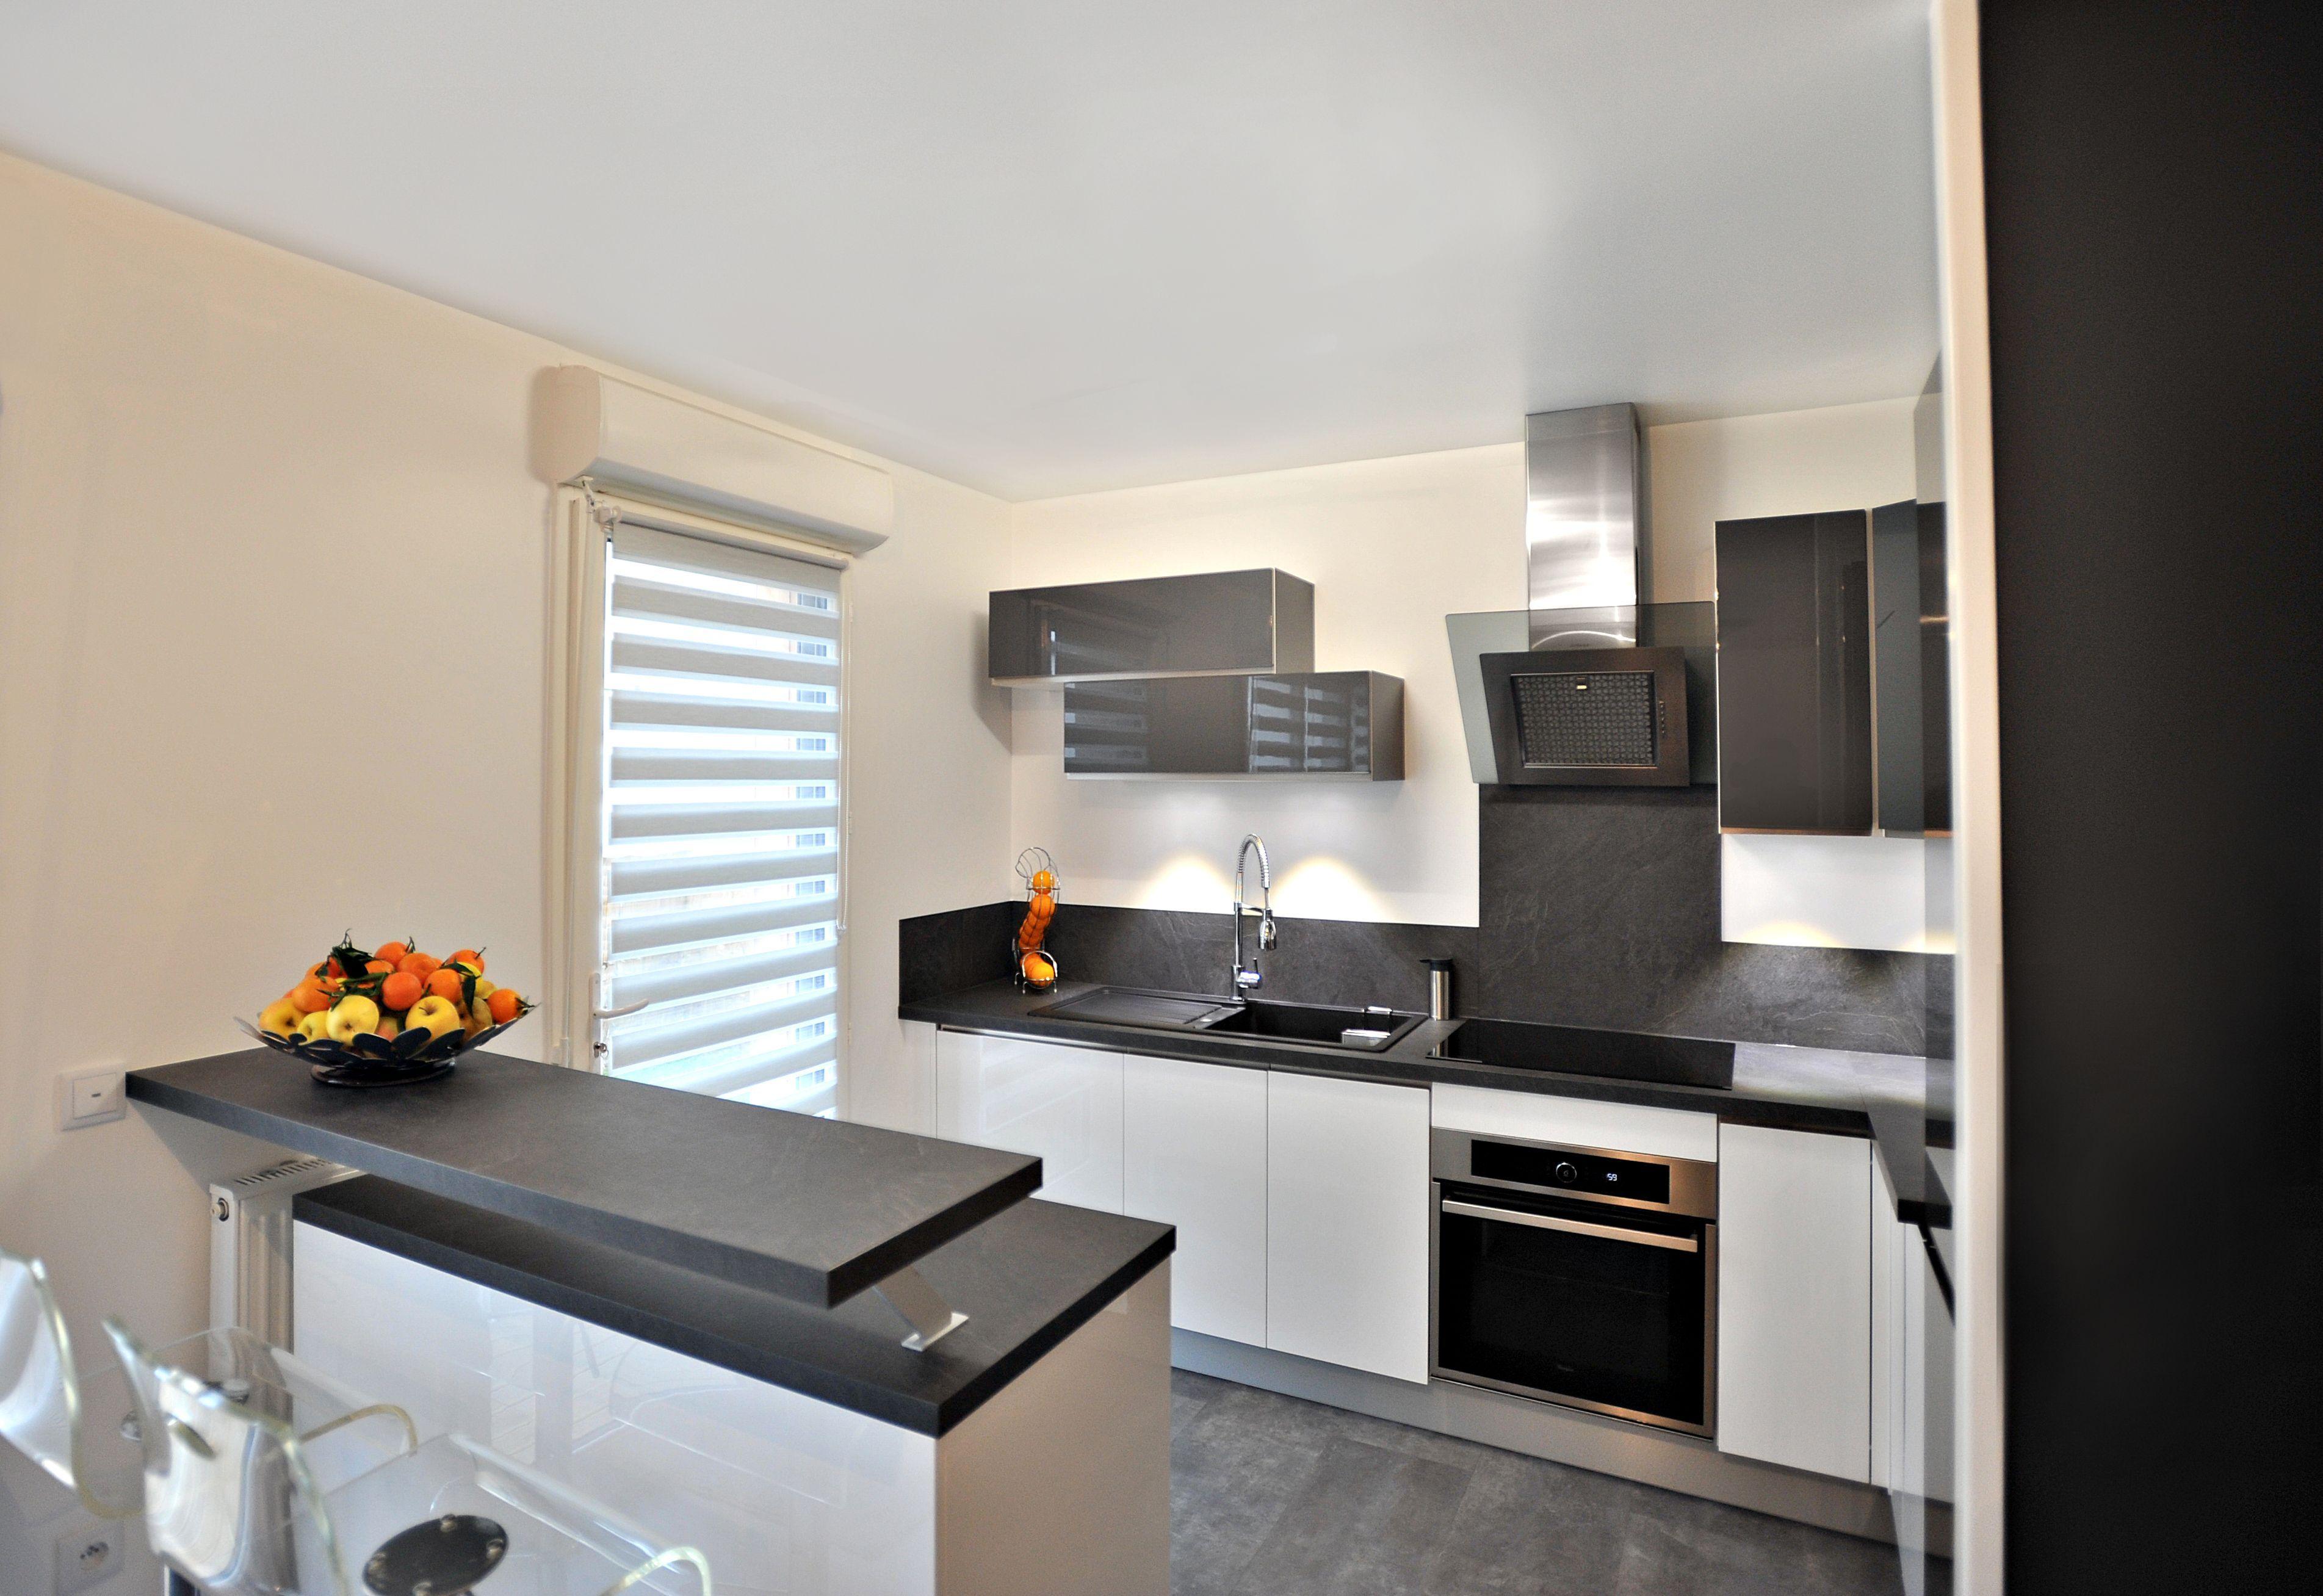 Renovation Cuisine Grise Et Blanche Laquee Plan De Travail Stratifie Gris Anthracite Plan Snack Secretsd White Modern Kitchen Kitchen Remodel Grey Kitchens